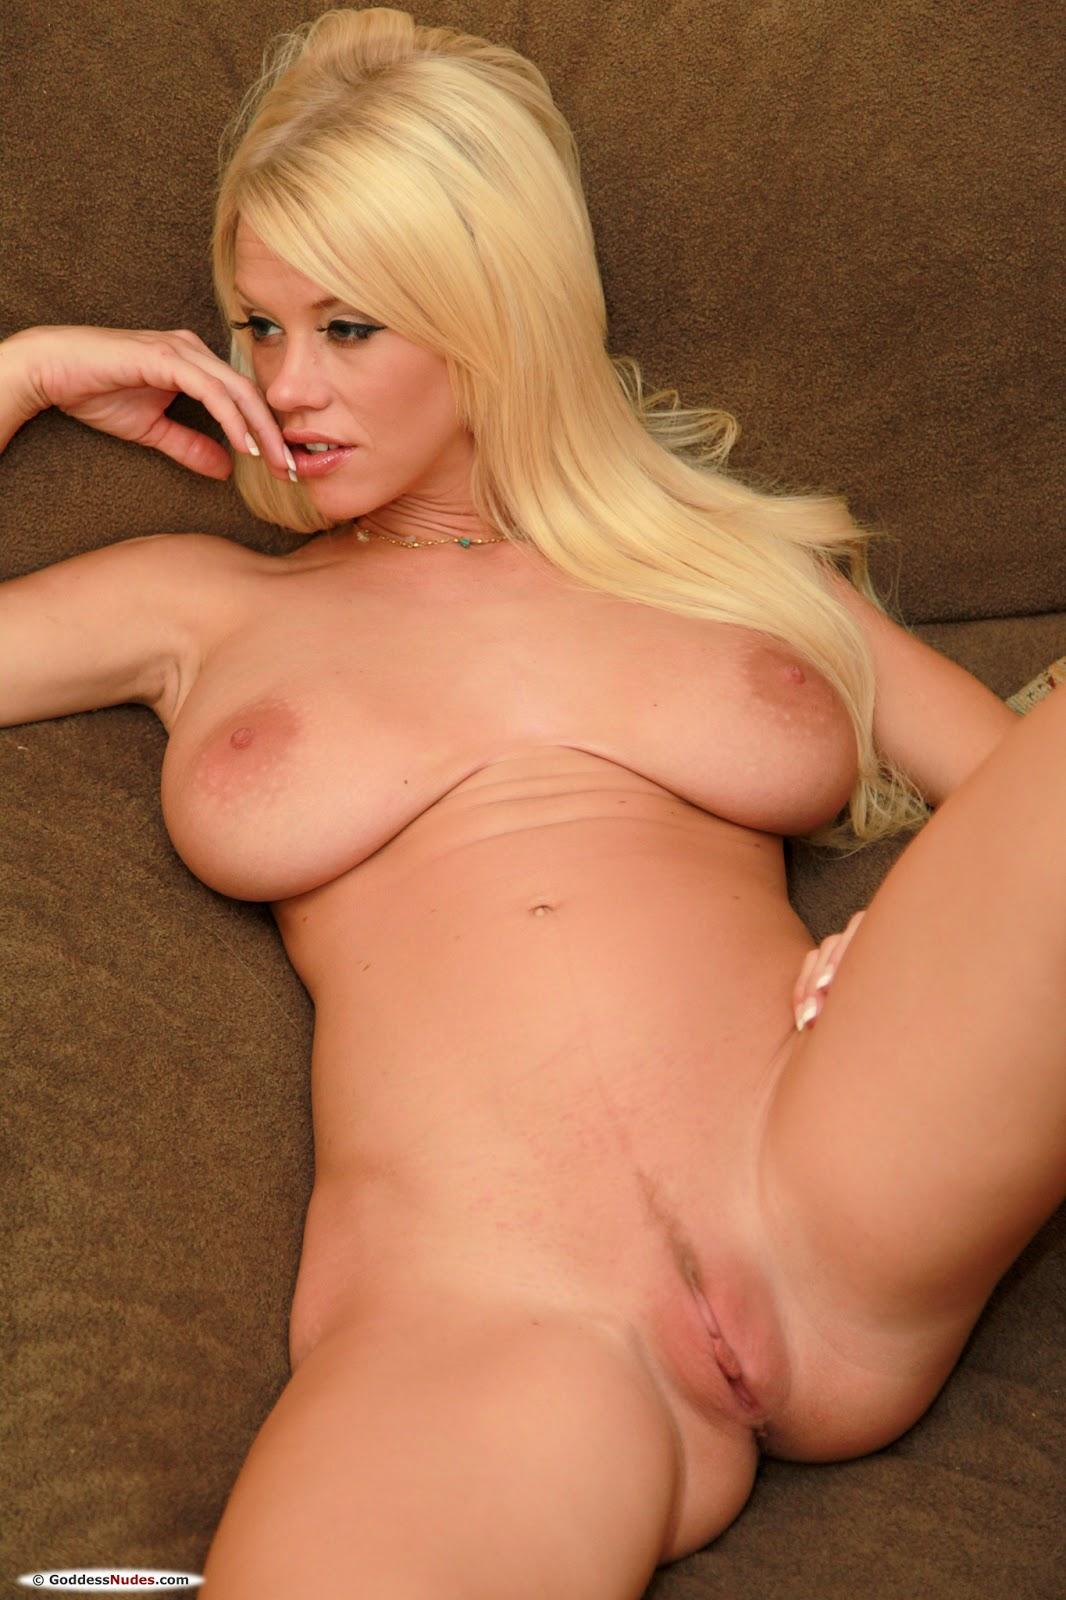 Courtney christina o connell nude